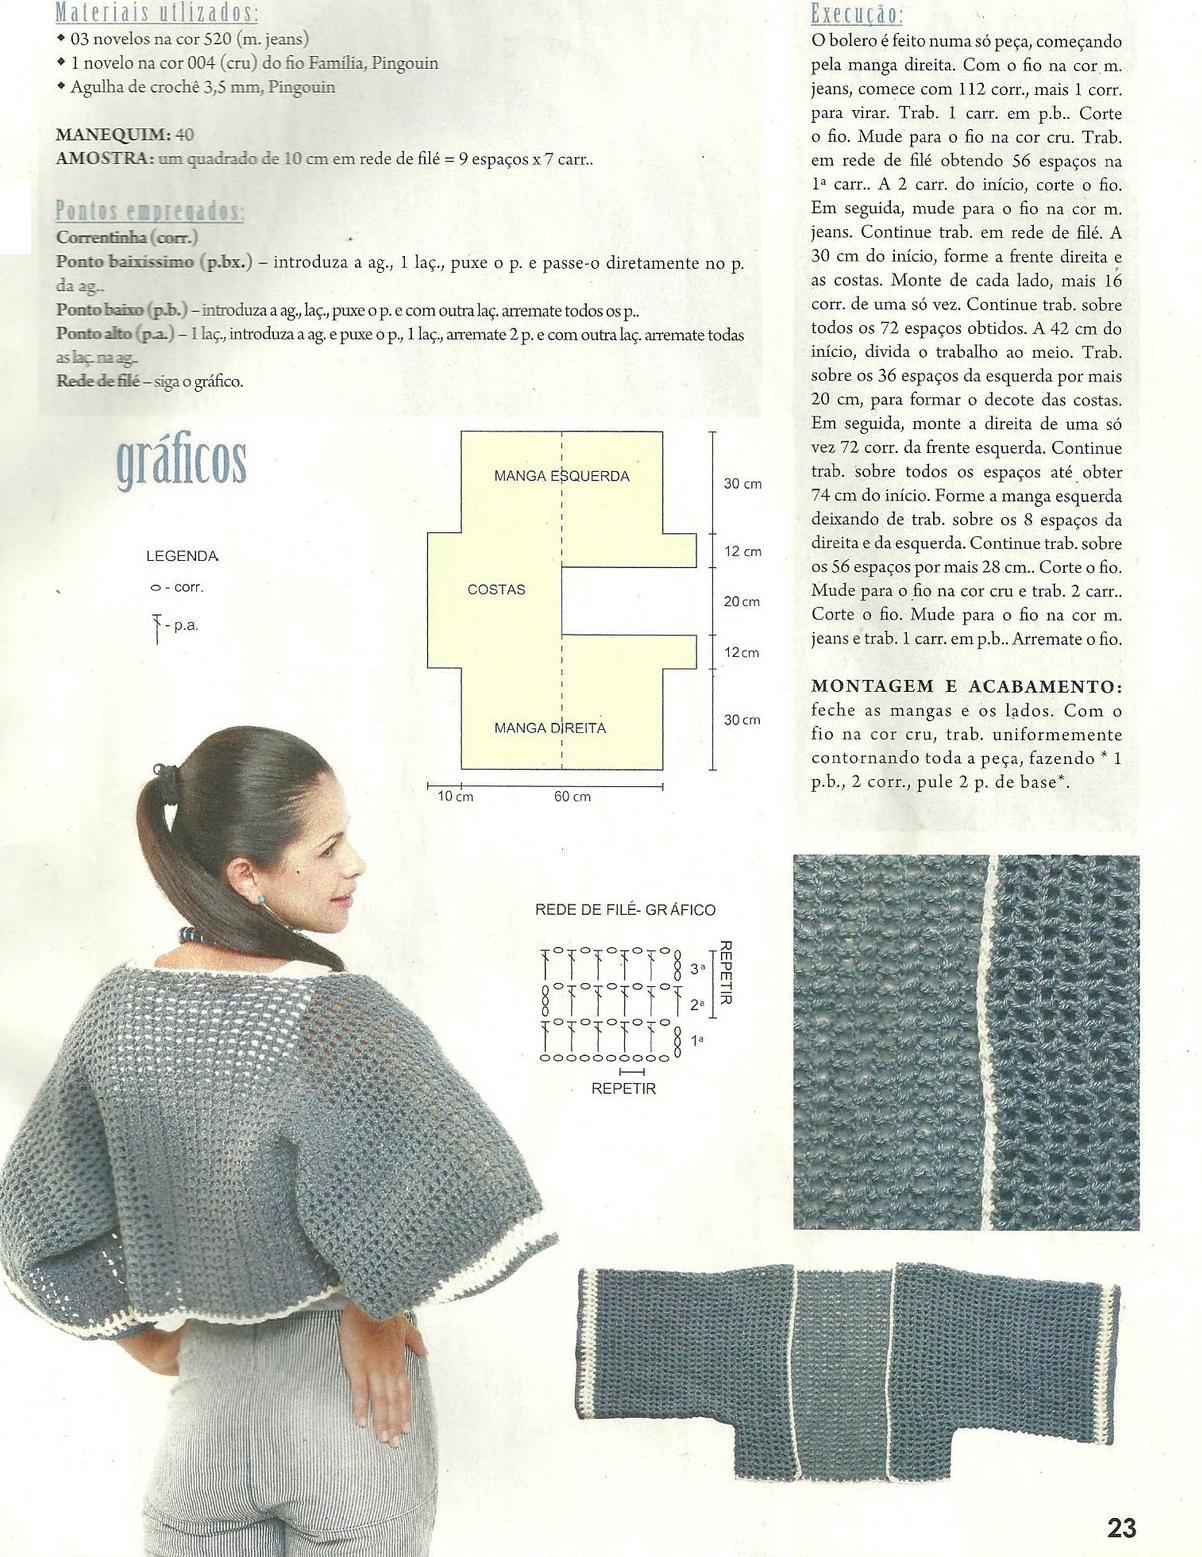 Bolero manga media ancha Patron - Patrones Crochet | Boleros manga ...